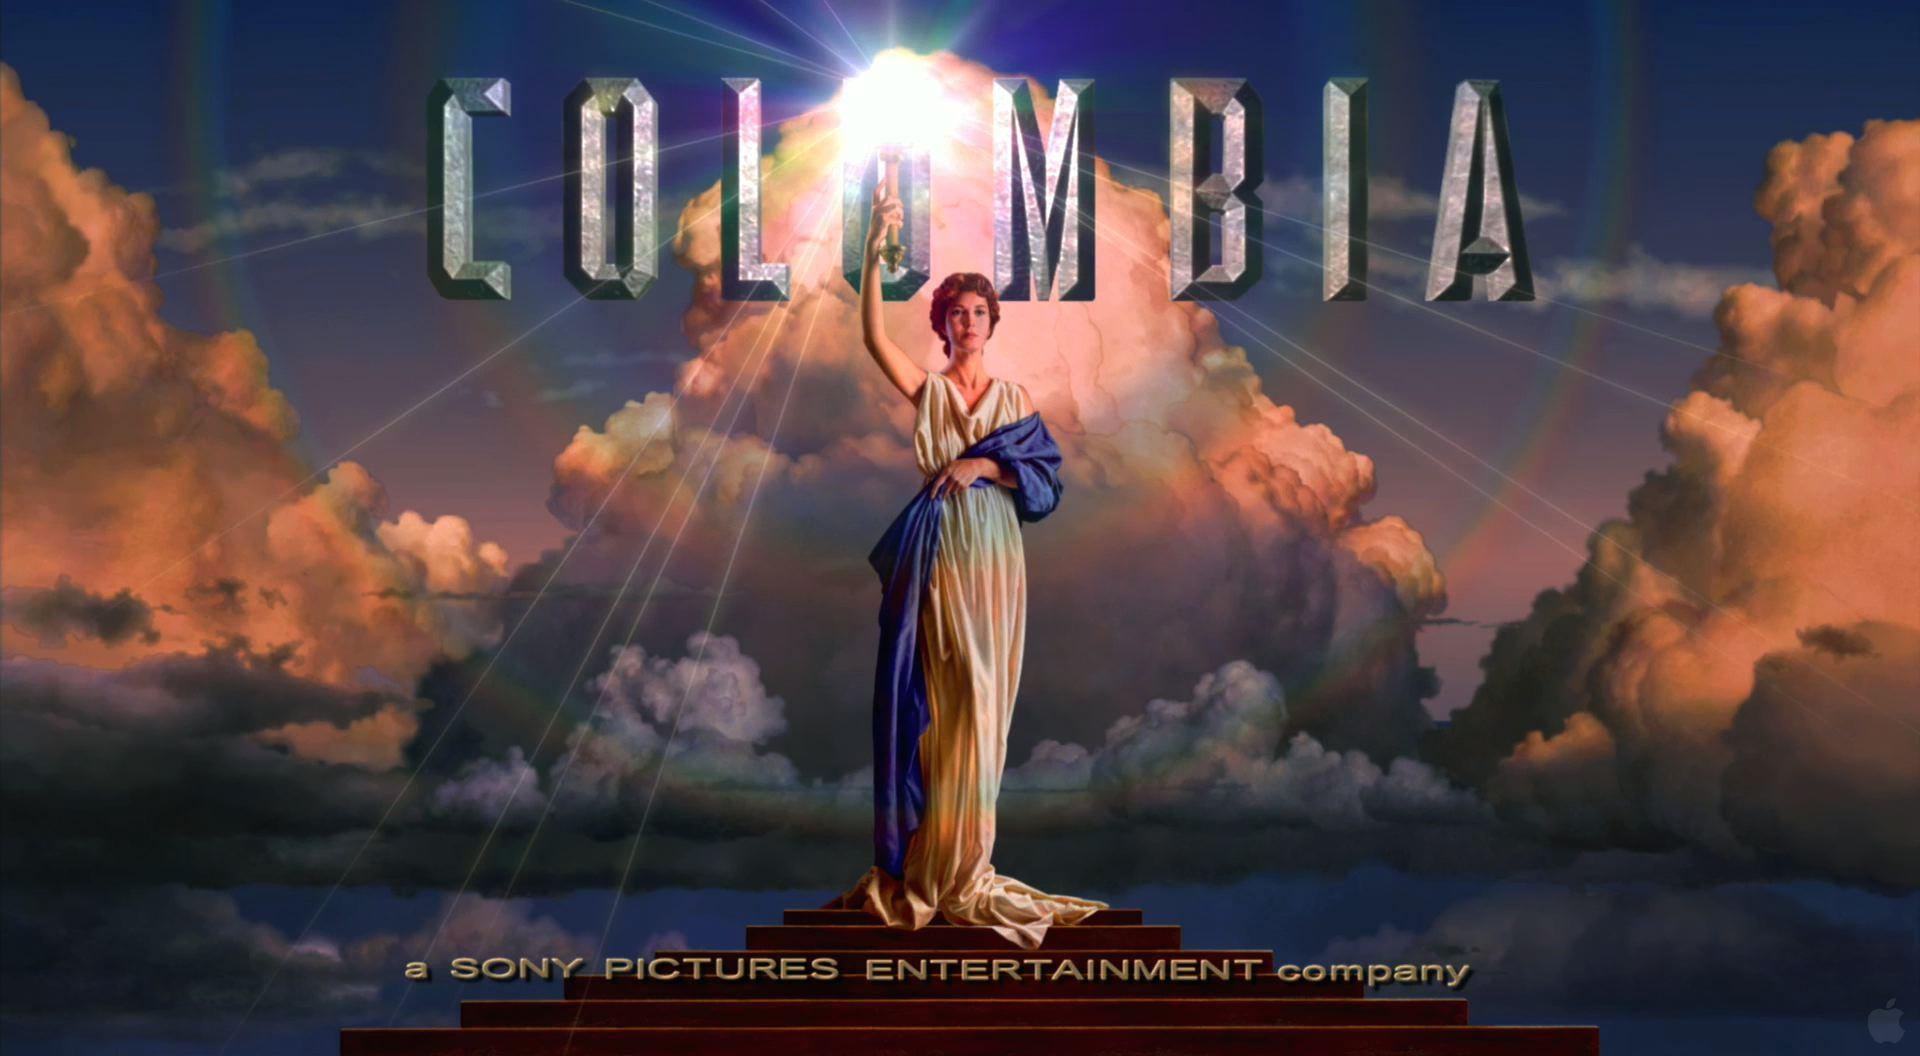 Columbia-Pictures-Movie-Studio-logo-wallpaper.jpg